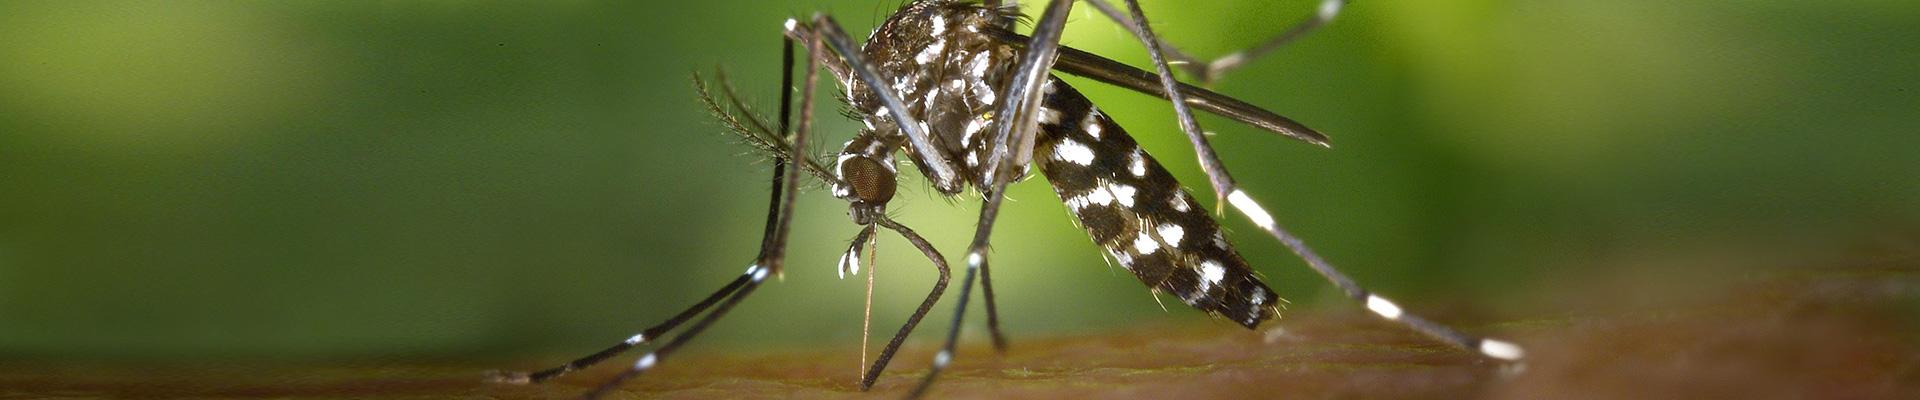 Kil Mor Pest Management Mosquito Control